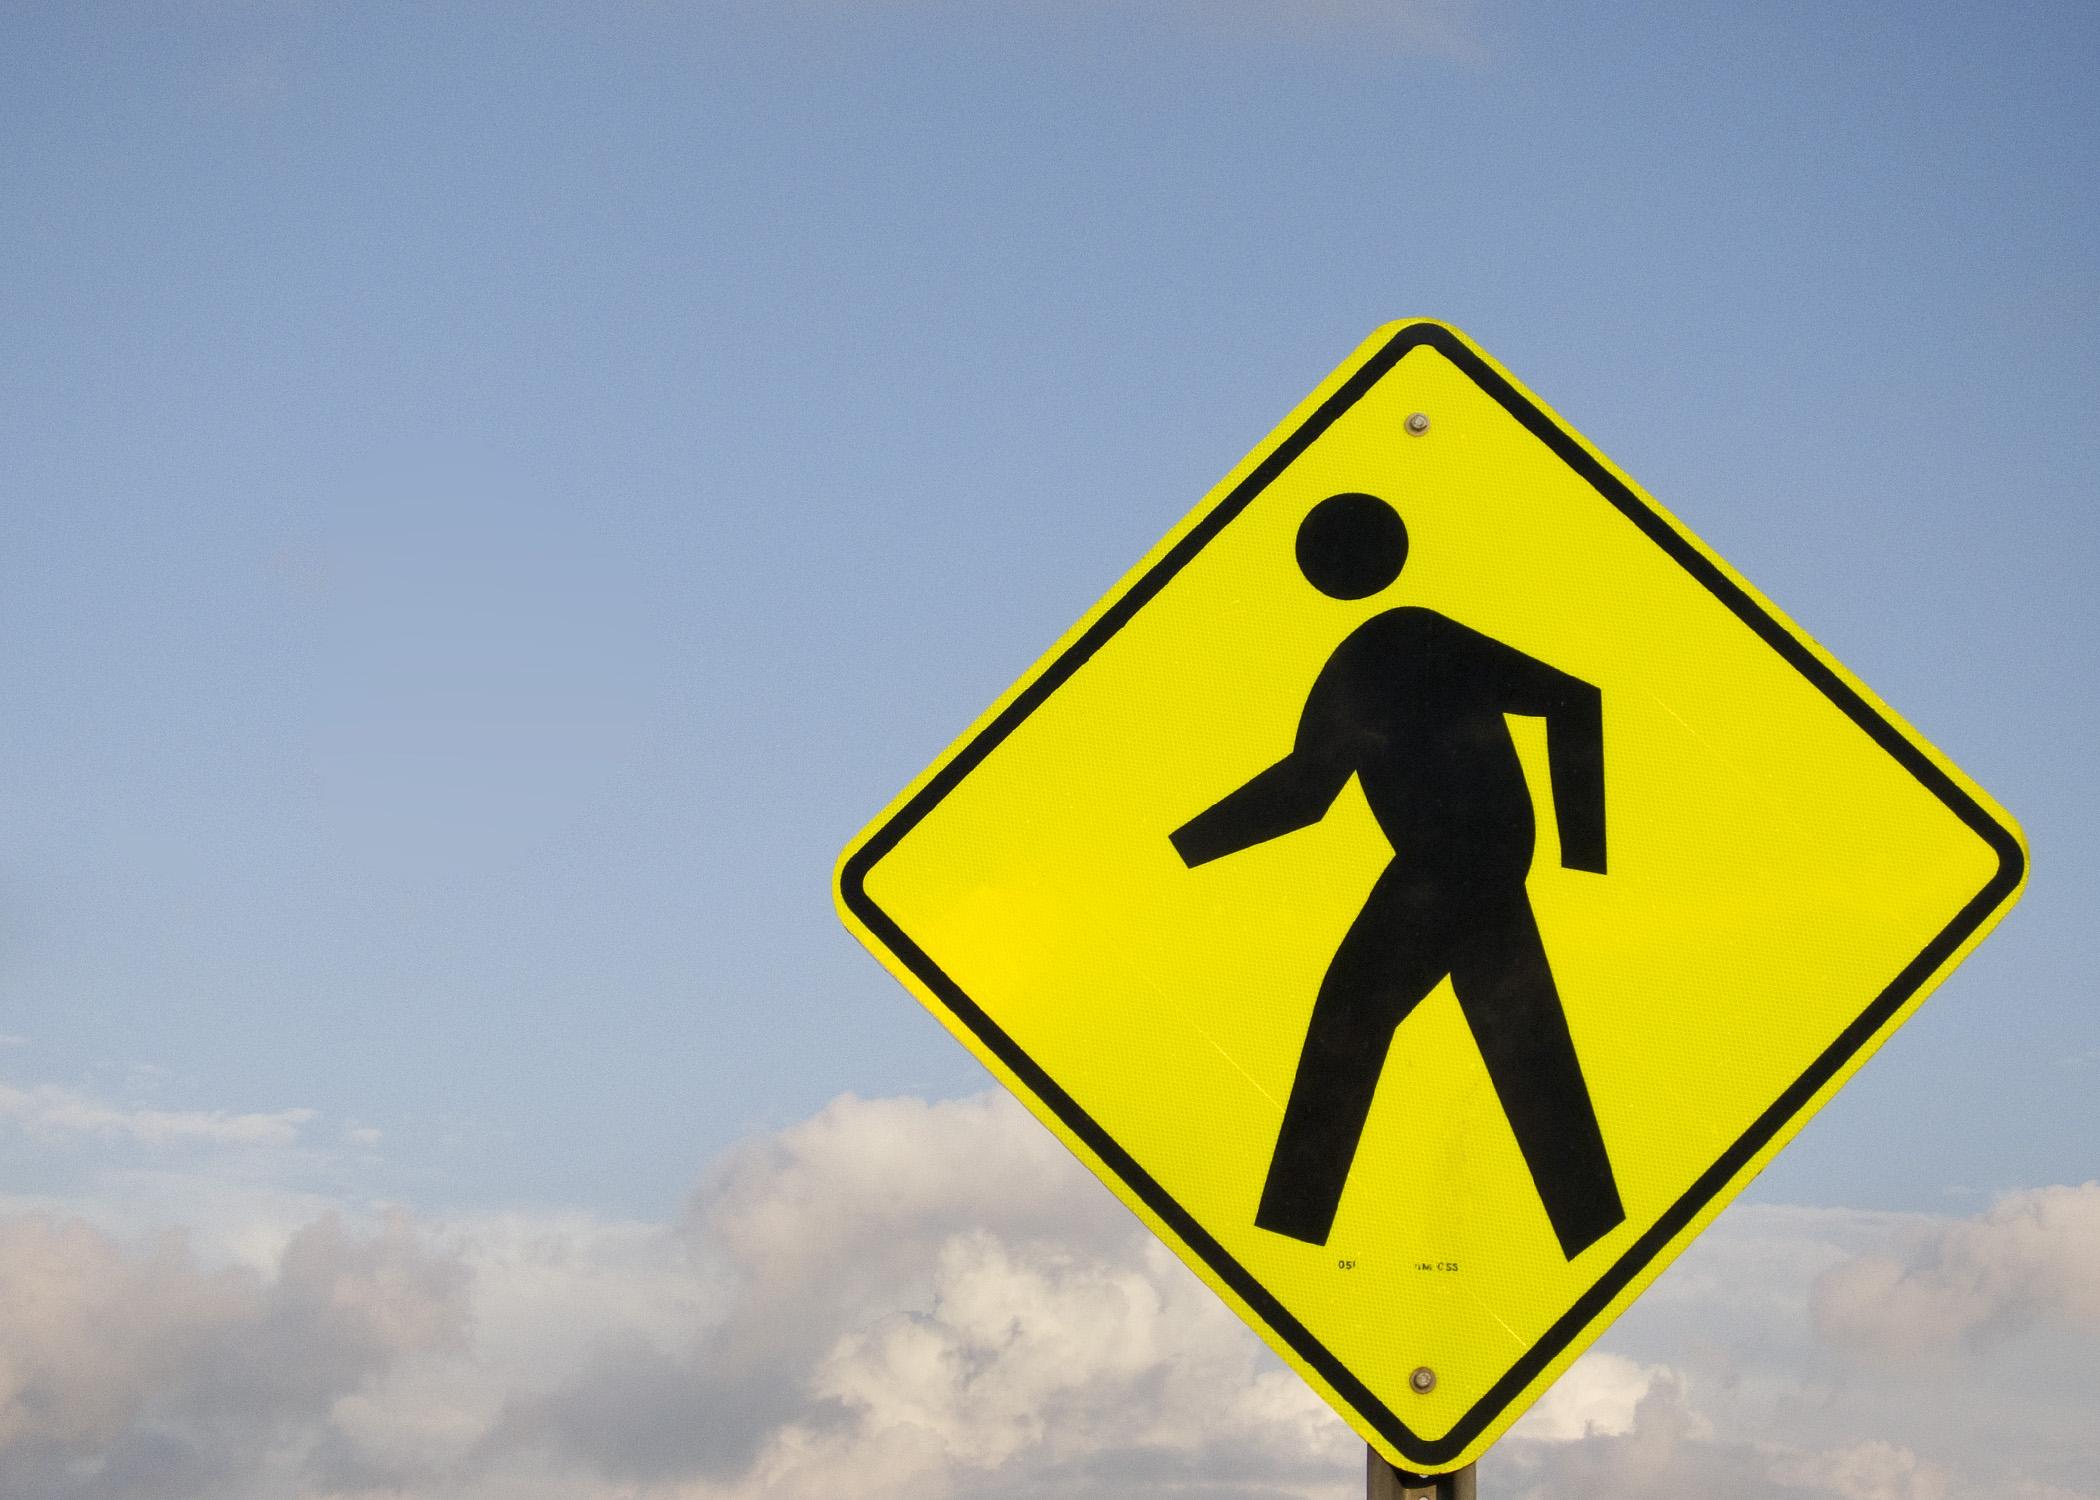 Crosswalk sign. (Credit: Robert Couse-Baker/Flickr)